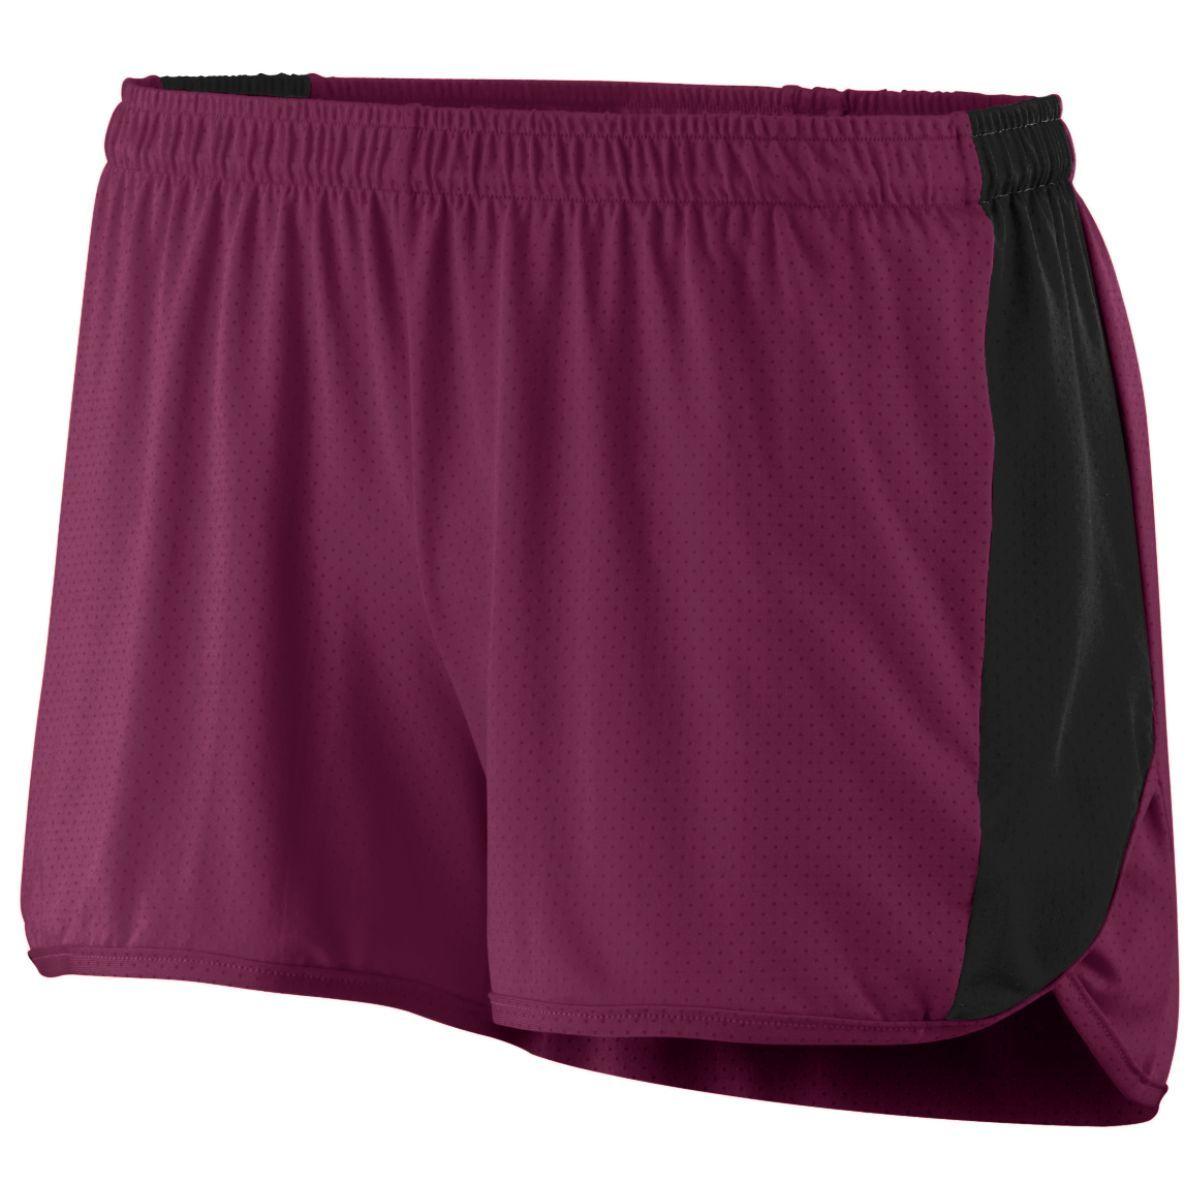 Ladies Sprint Shorts - MAROON/BLACK